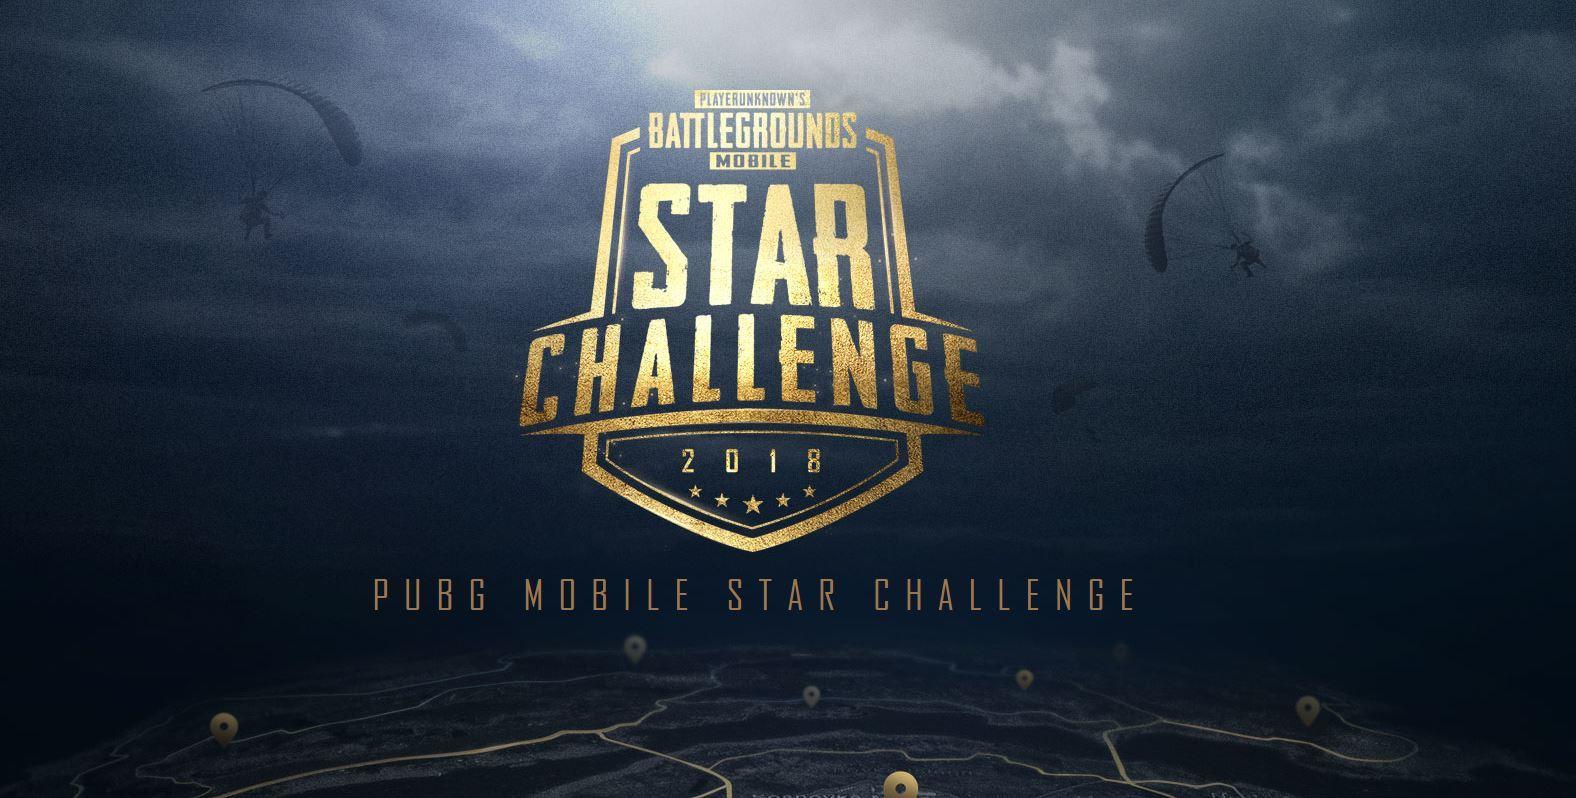 Bilder Zu Tencent And Pubg Corp Reveal Pubg Mobile Star Challenge 1 1